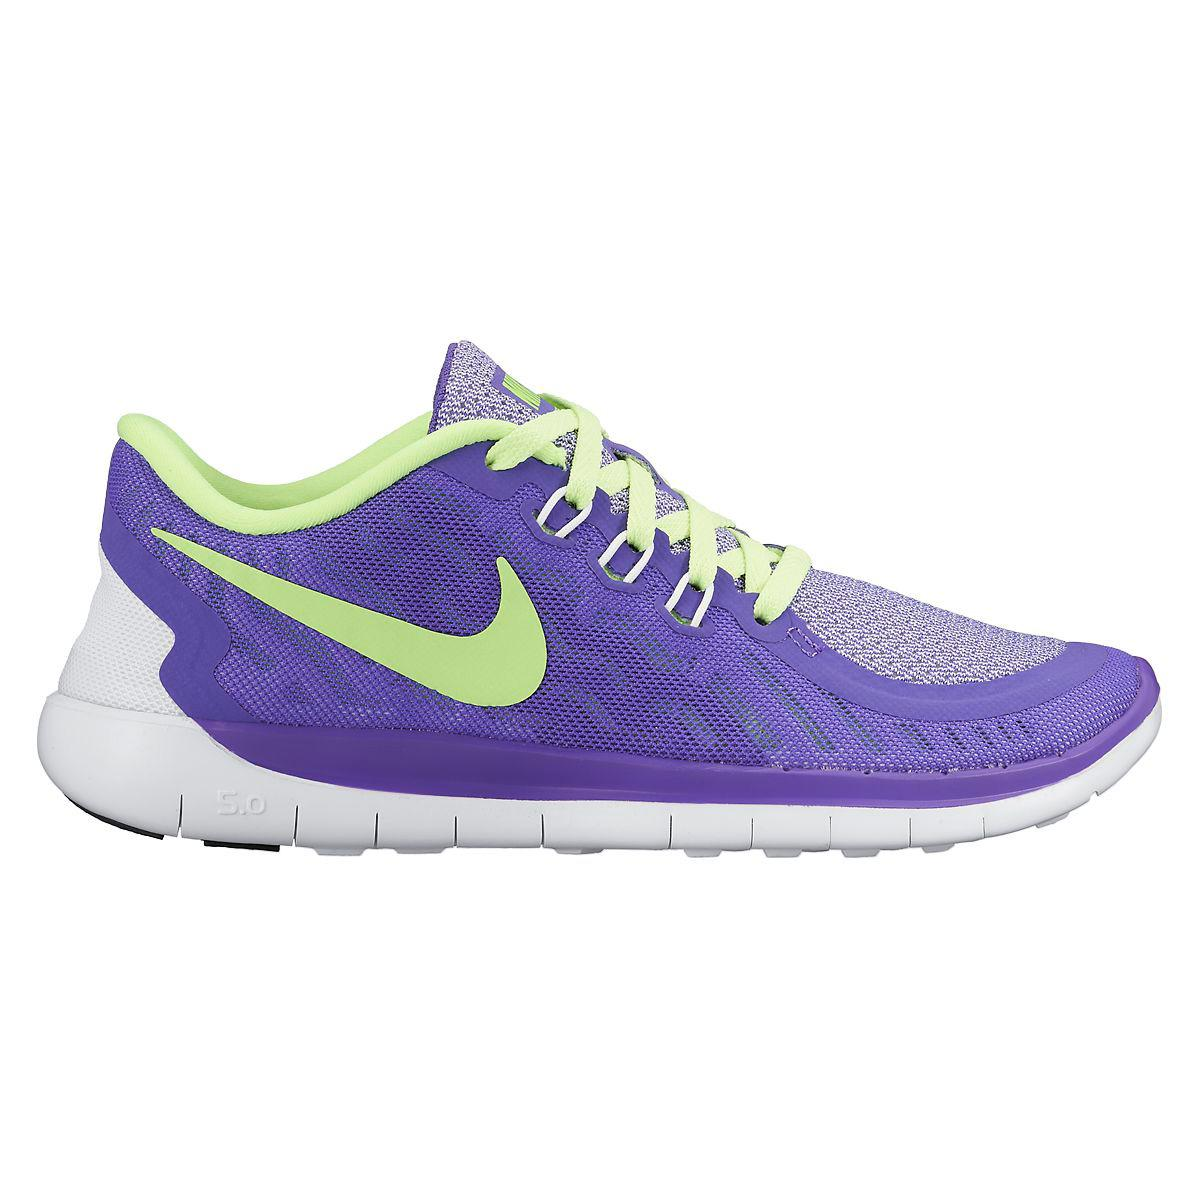 timeless design 5ab2a 9d915 Nike Girls Free 5.0 Running Shoes - Purple Green - Tennisnuts.com